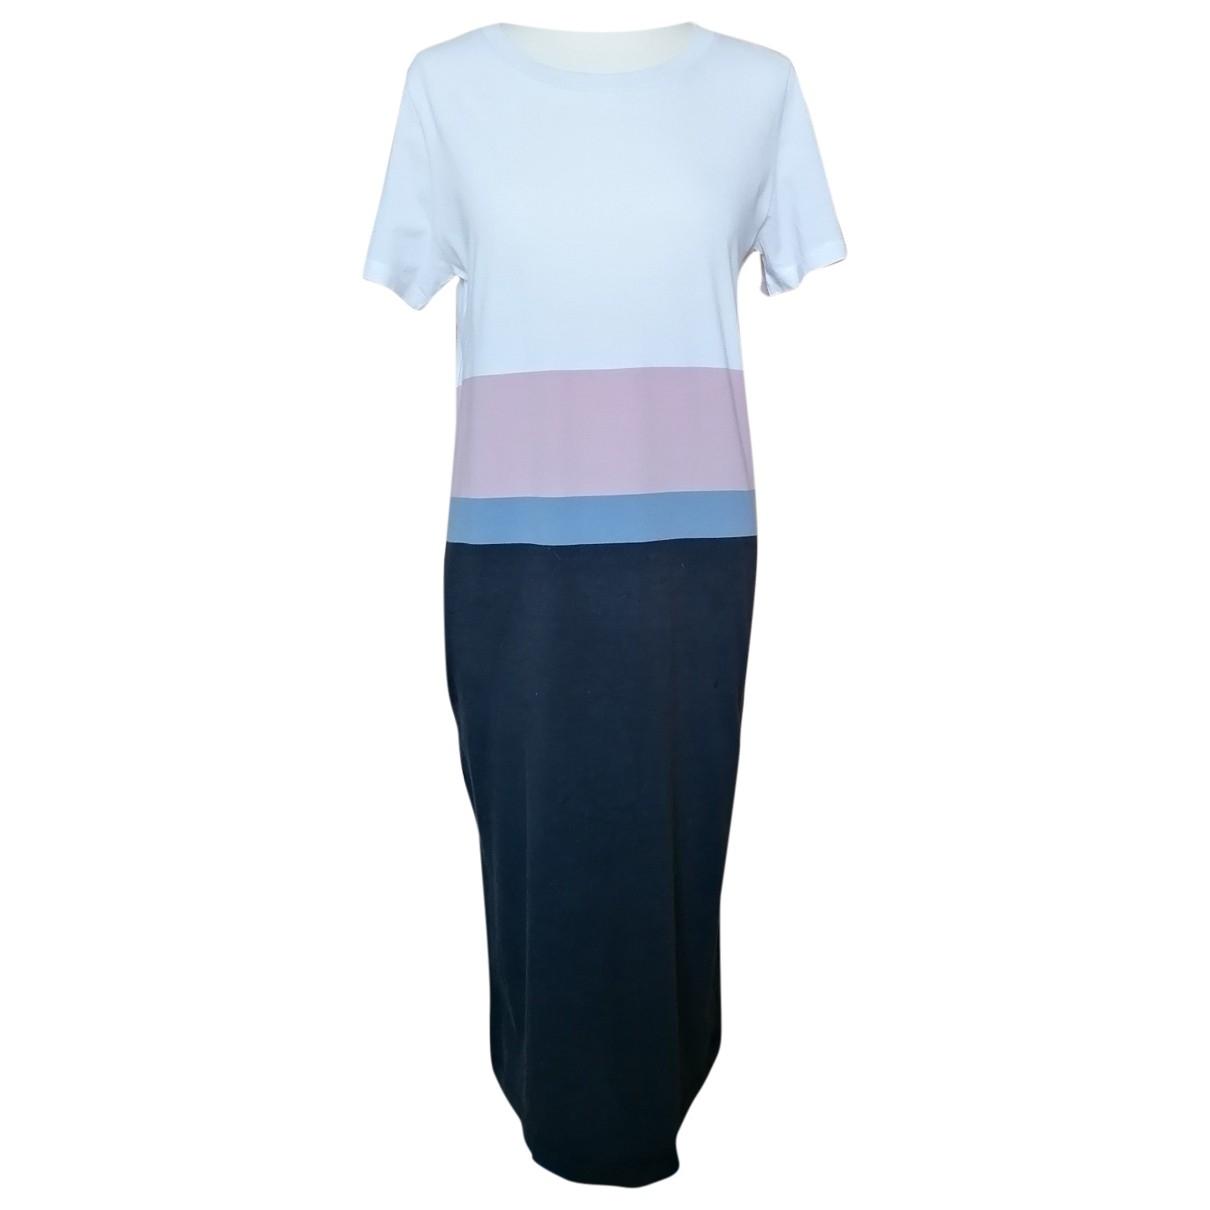 Cos \N Multicolour Cotton dress for Women S International